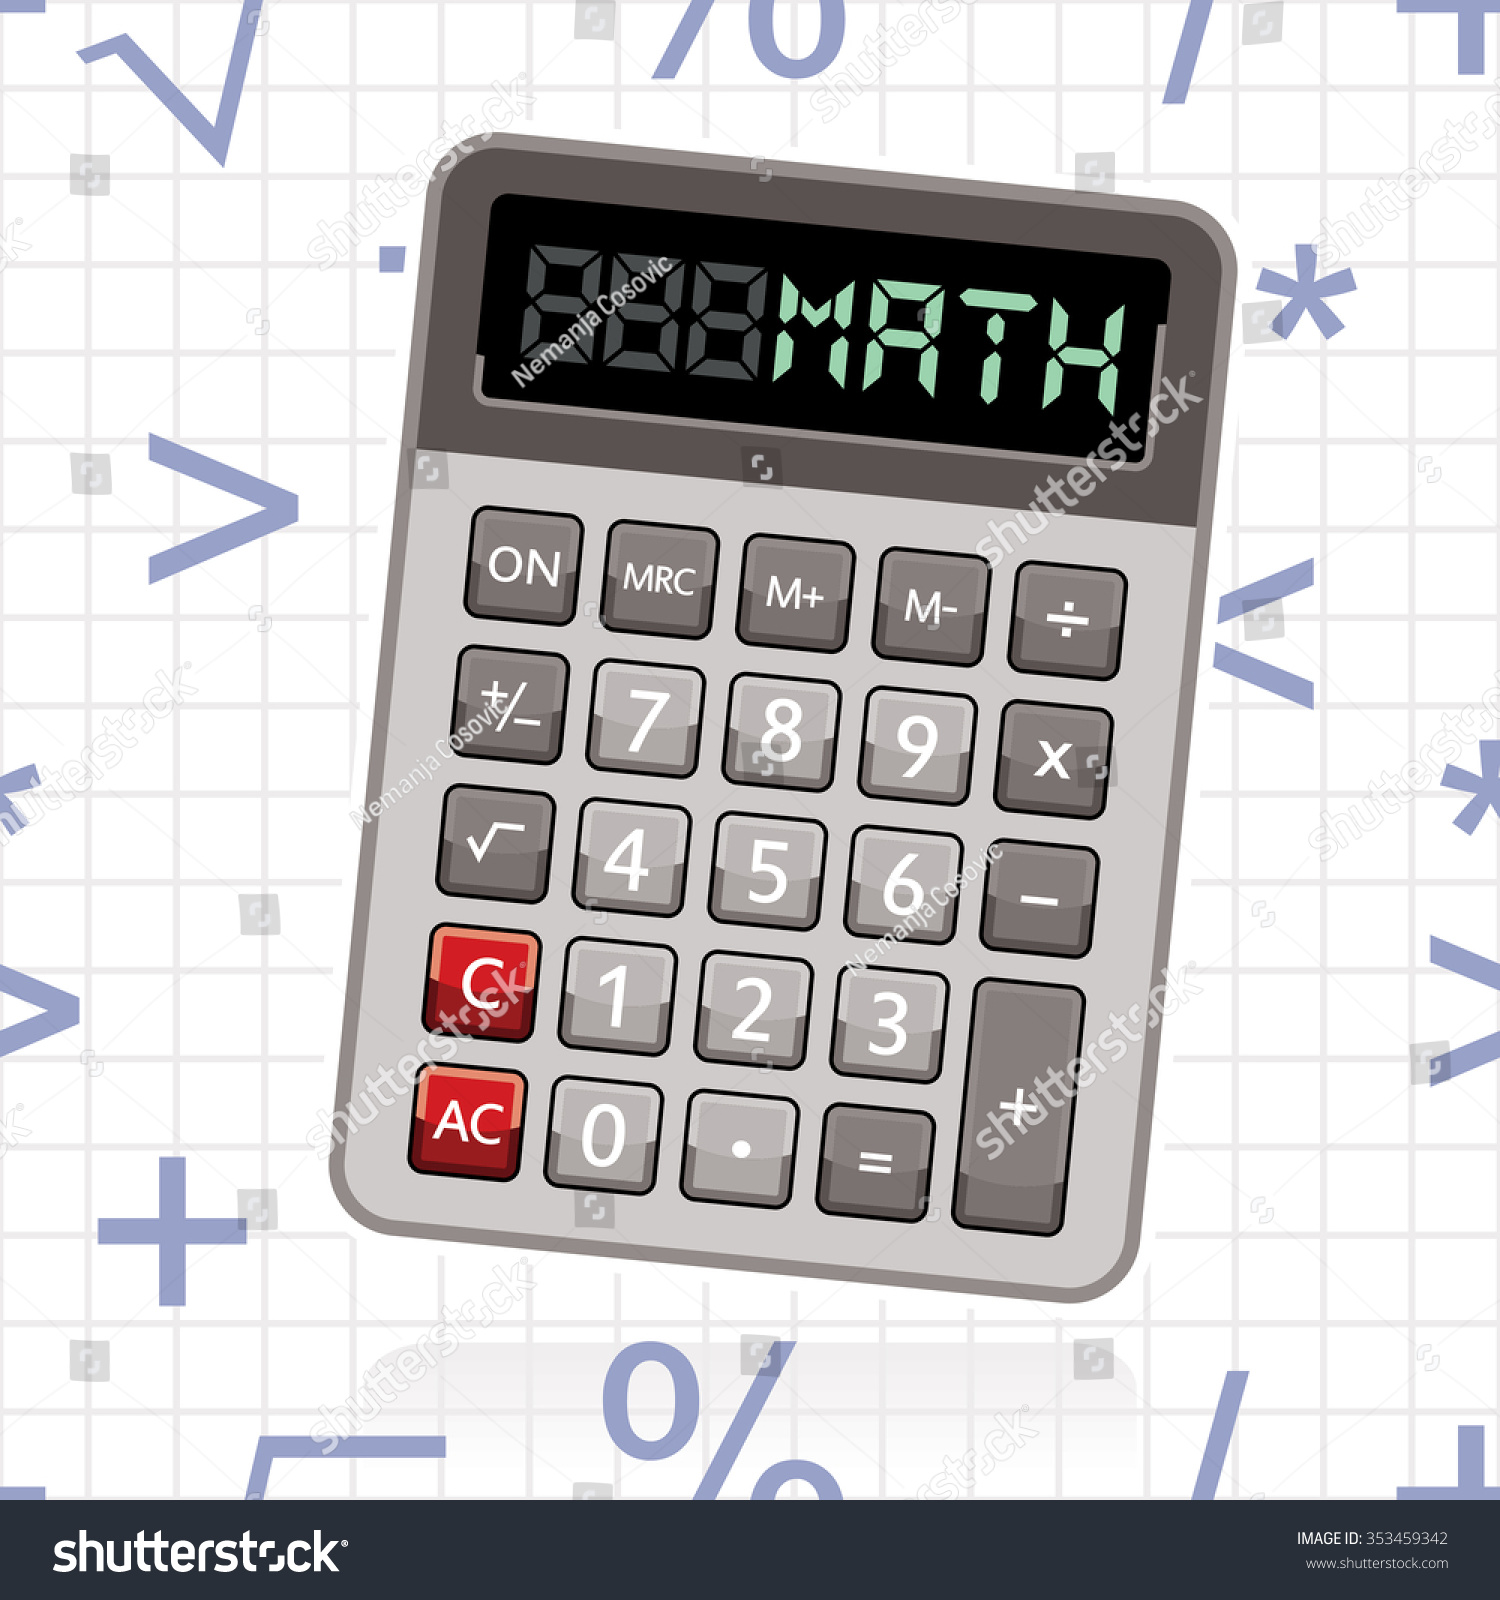 Calculator word math mathematical symbols background stock vector calculator with word math and mathematical symbols in background buycottarizona